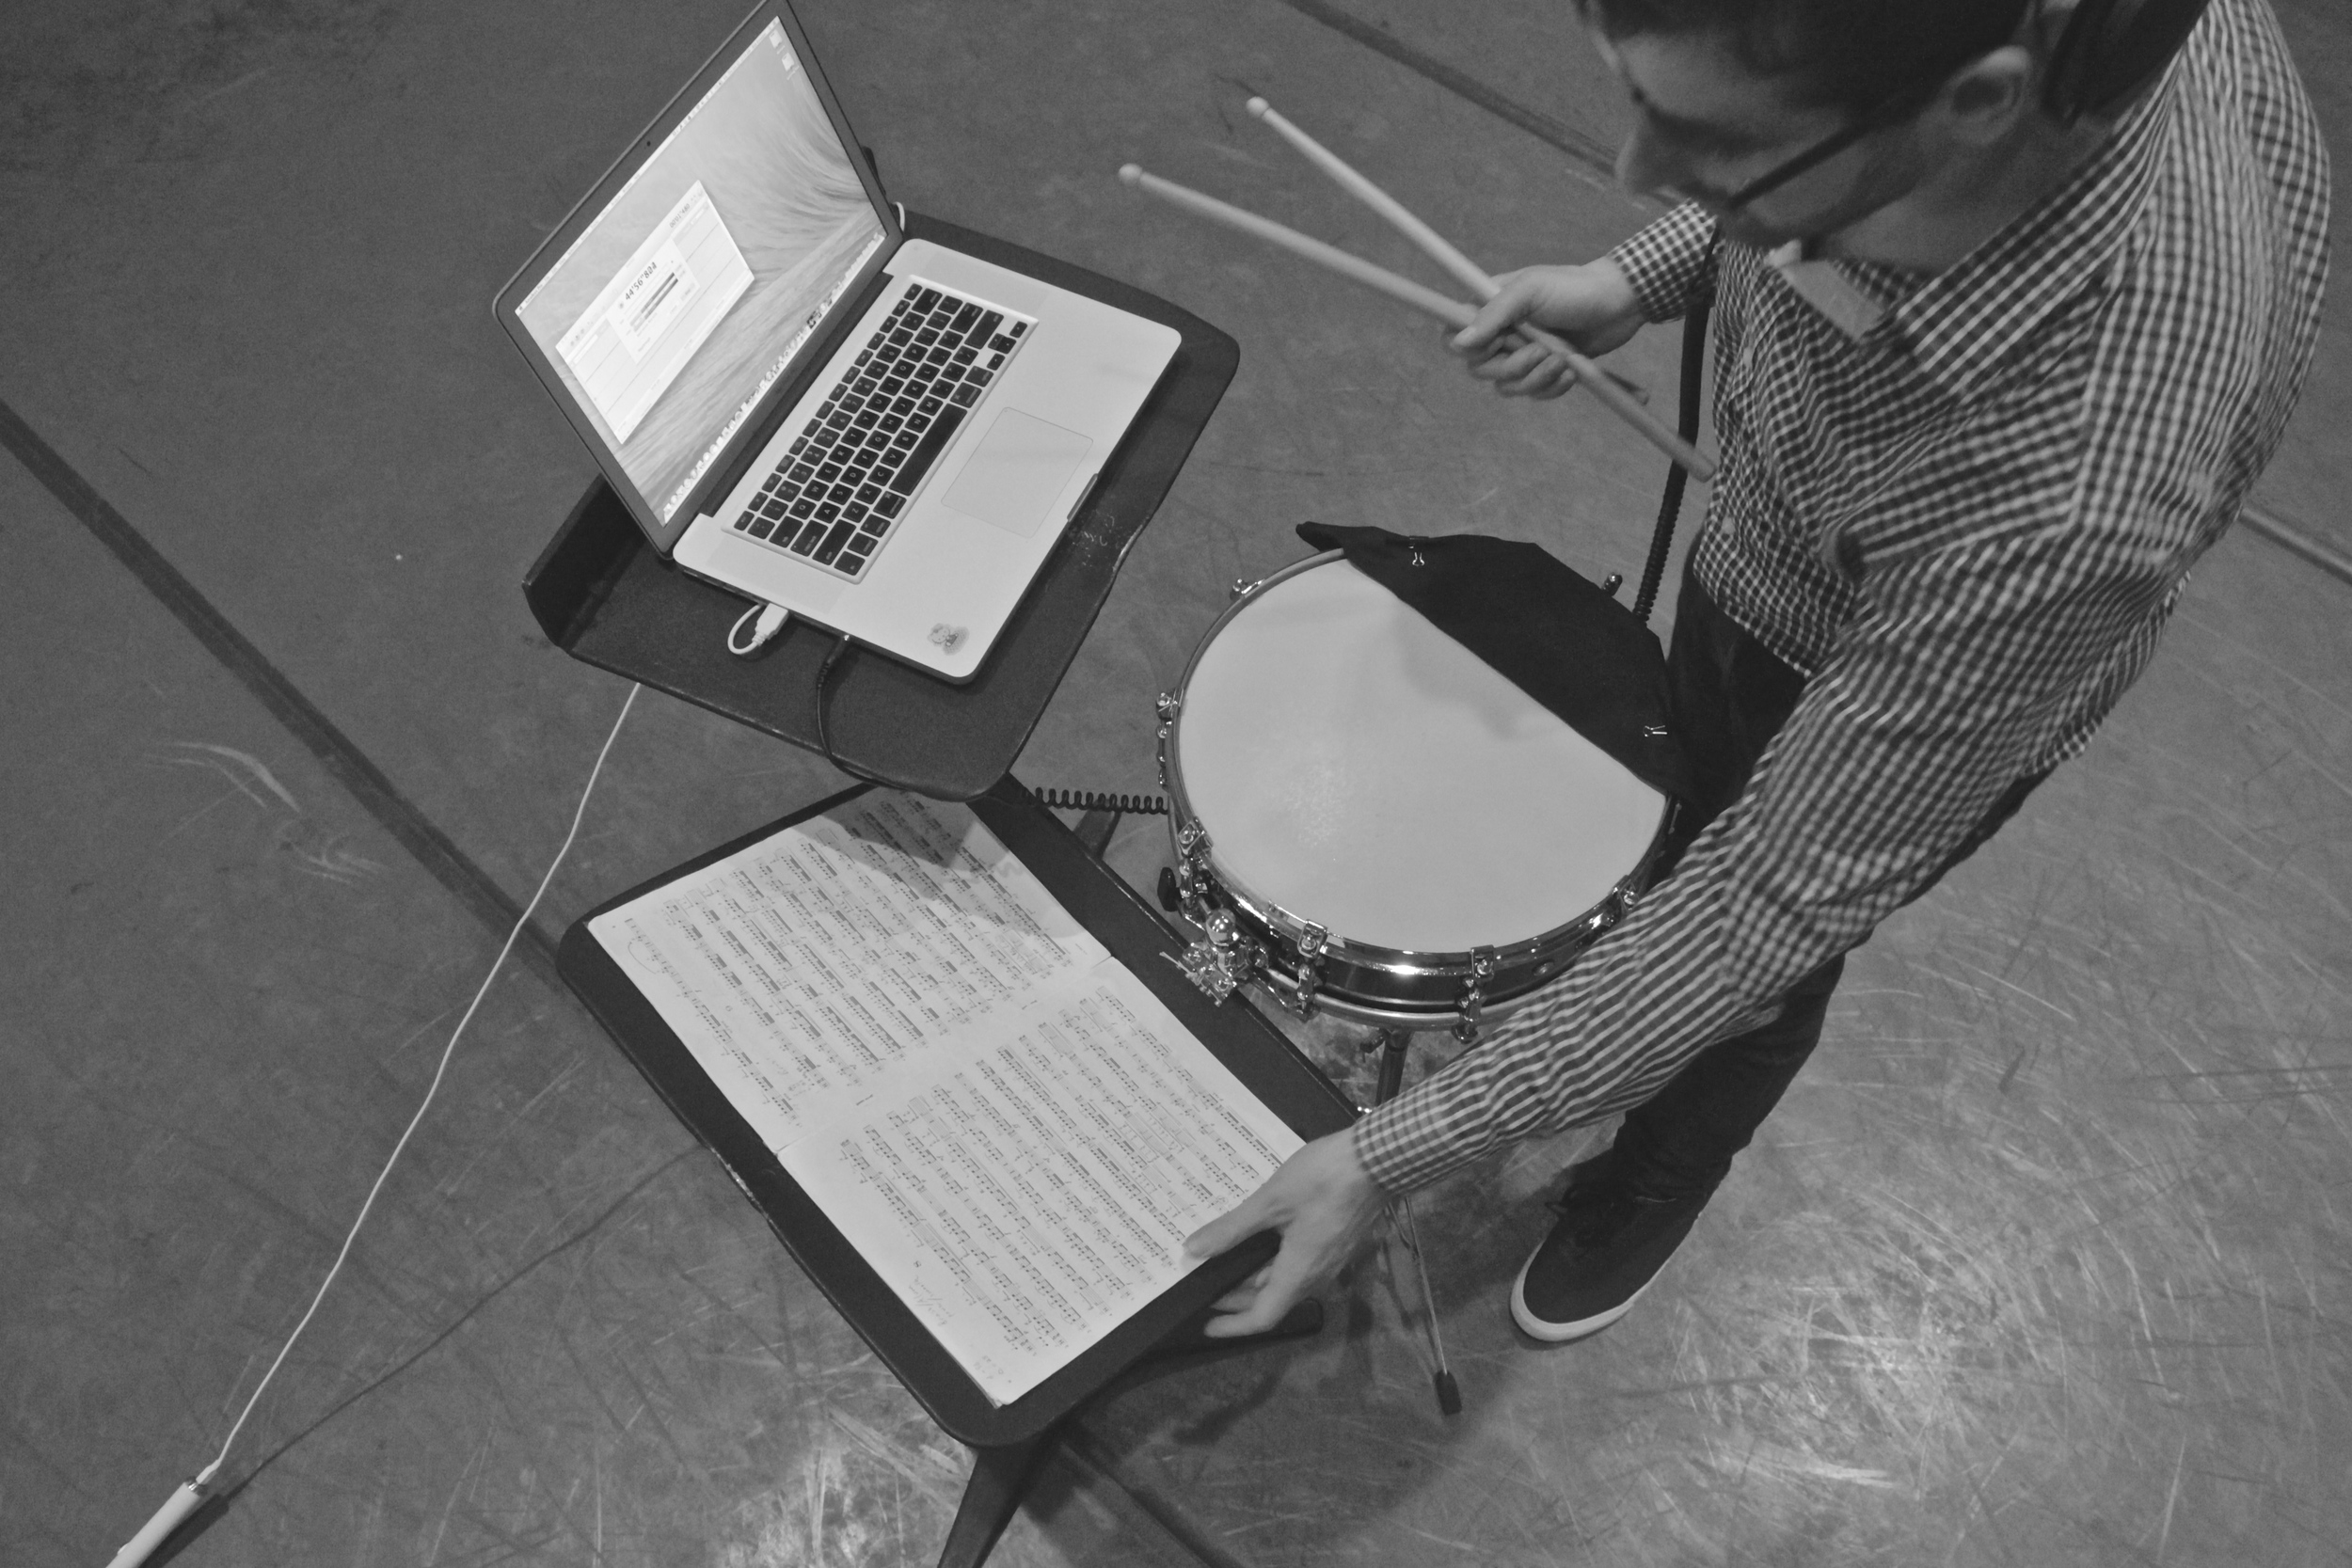 the self-recording setup